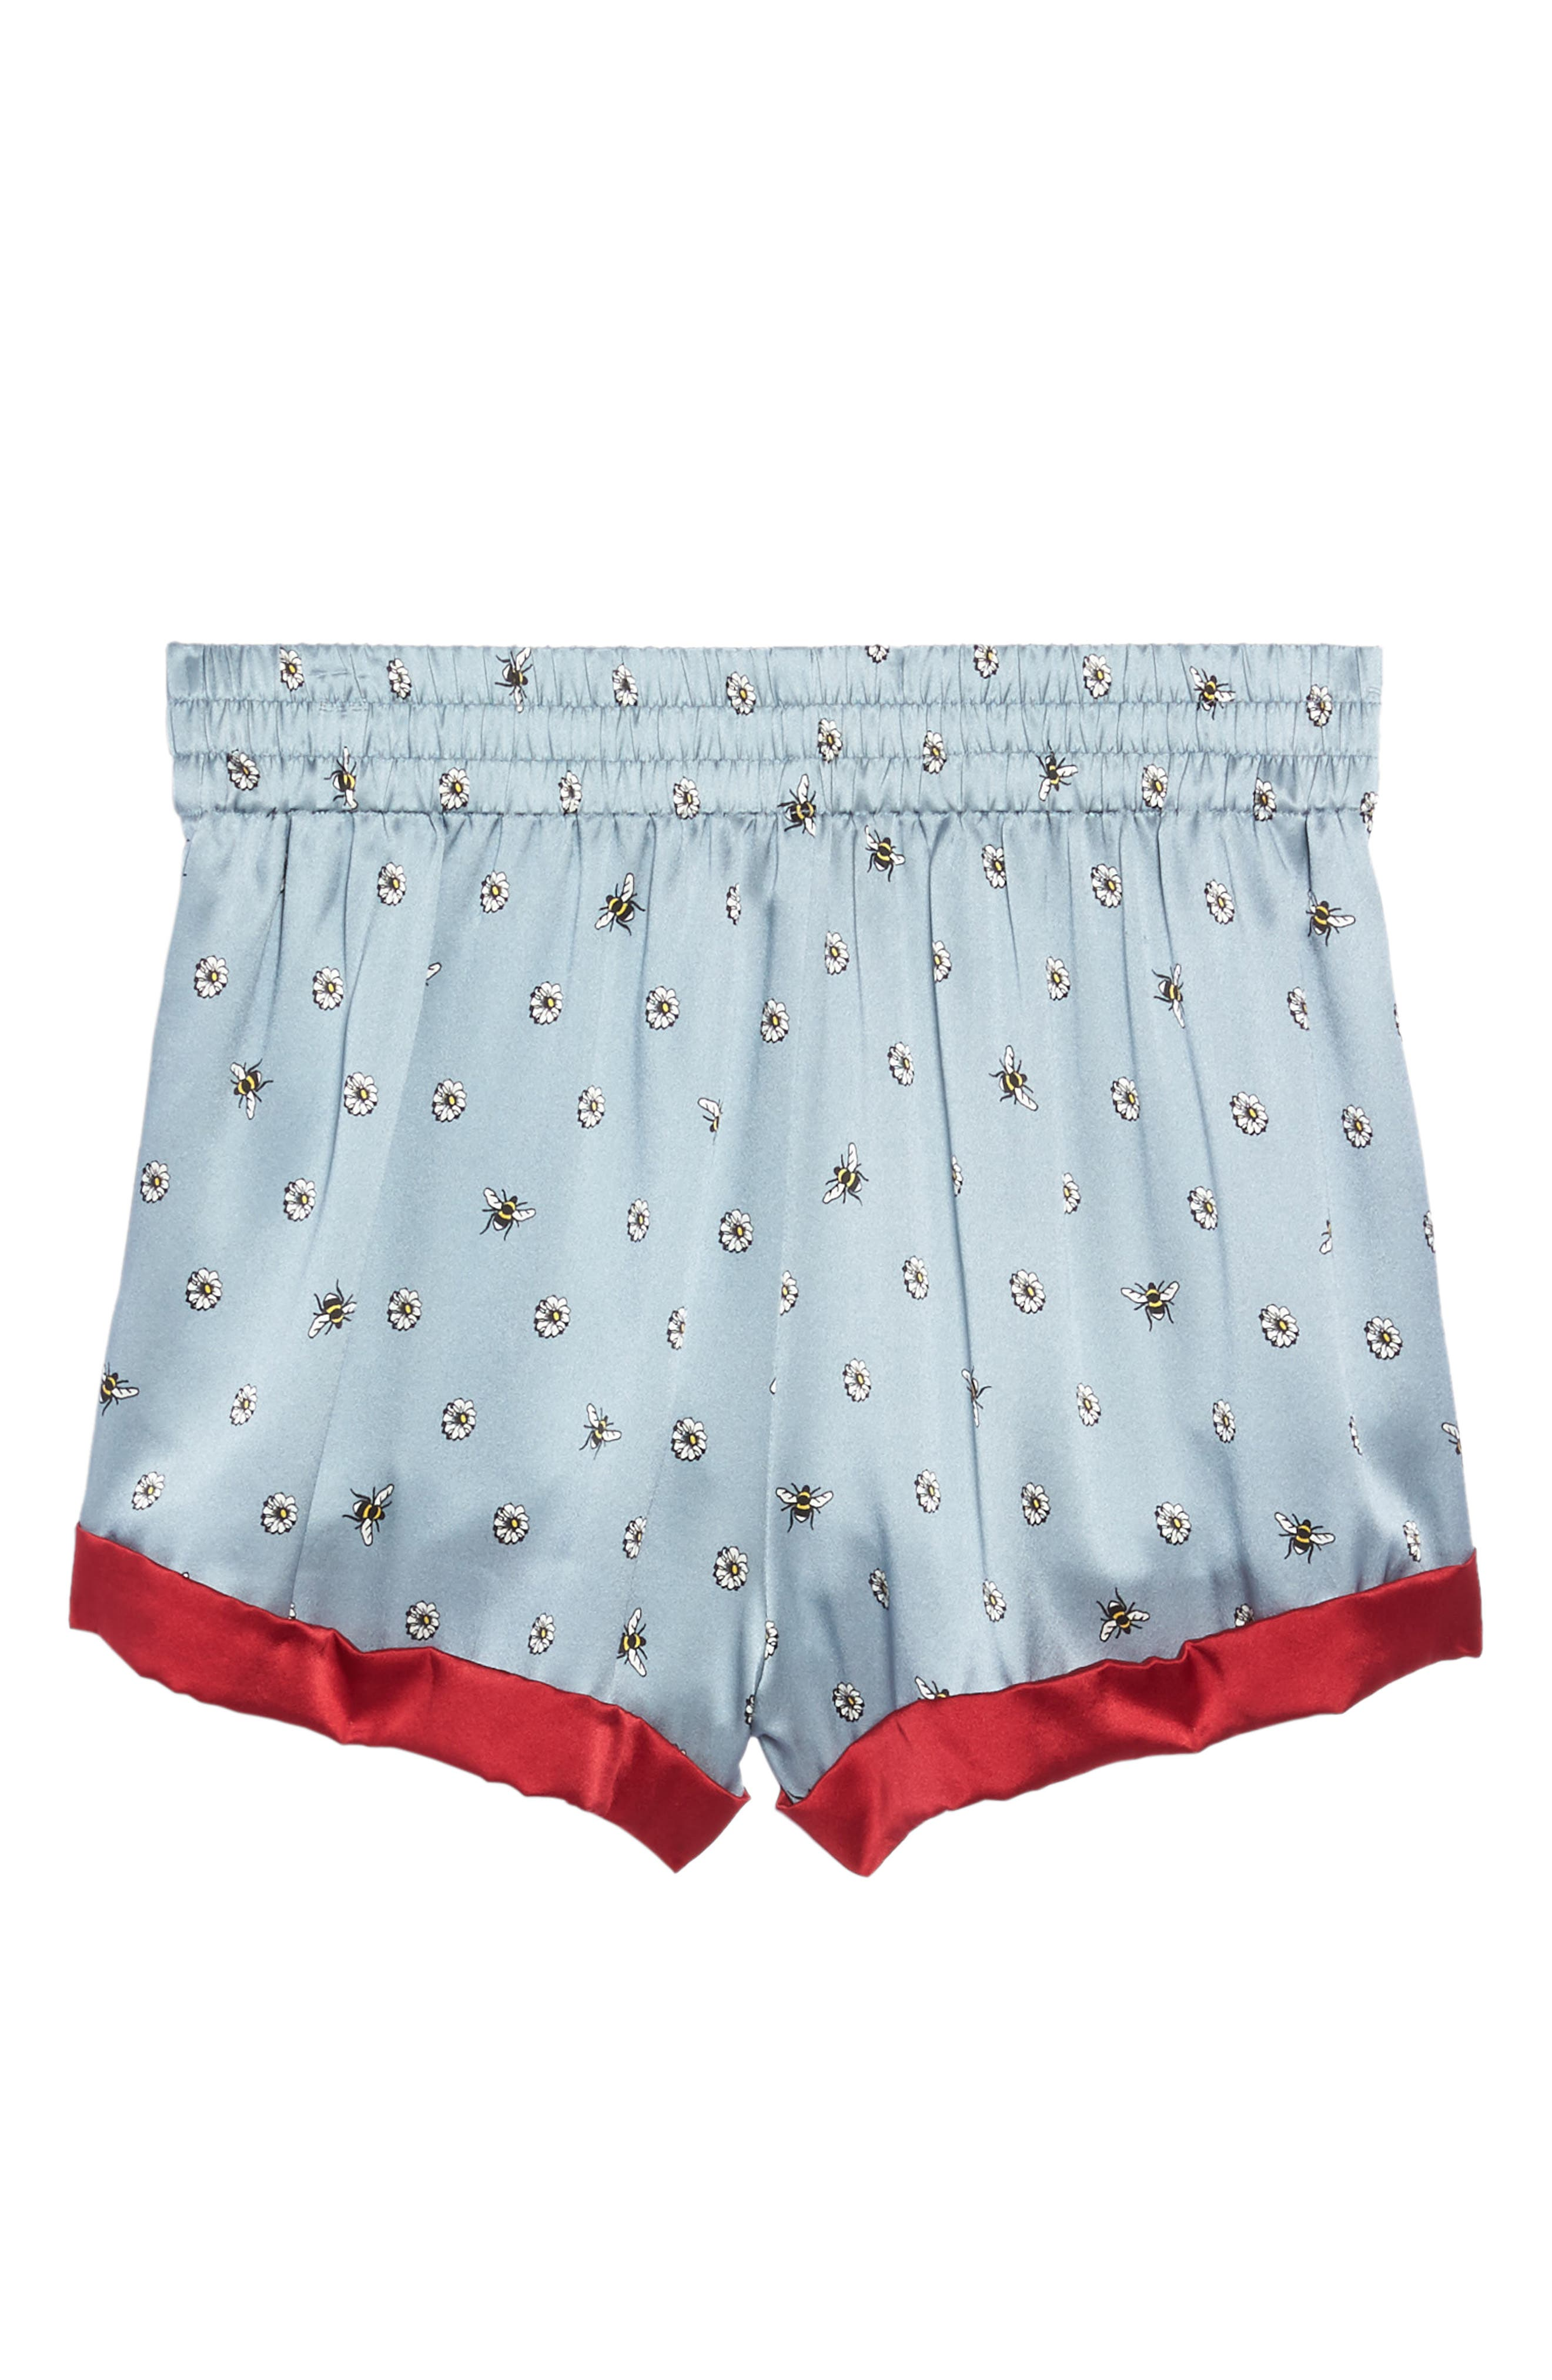 Chloe Silk Pajama Shorts,                             Alternate thumbnail 6, color,                             490